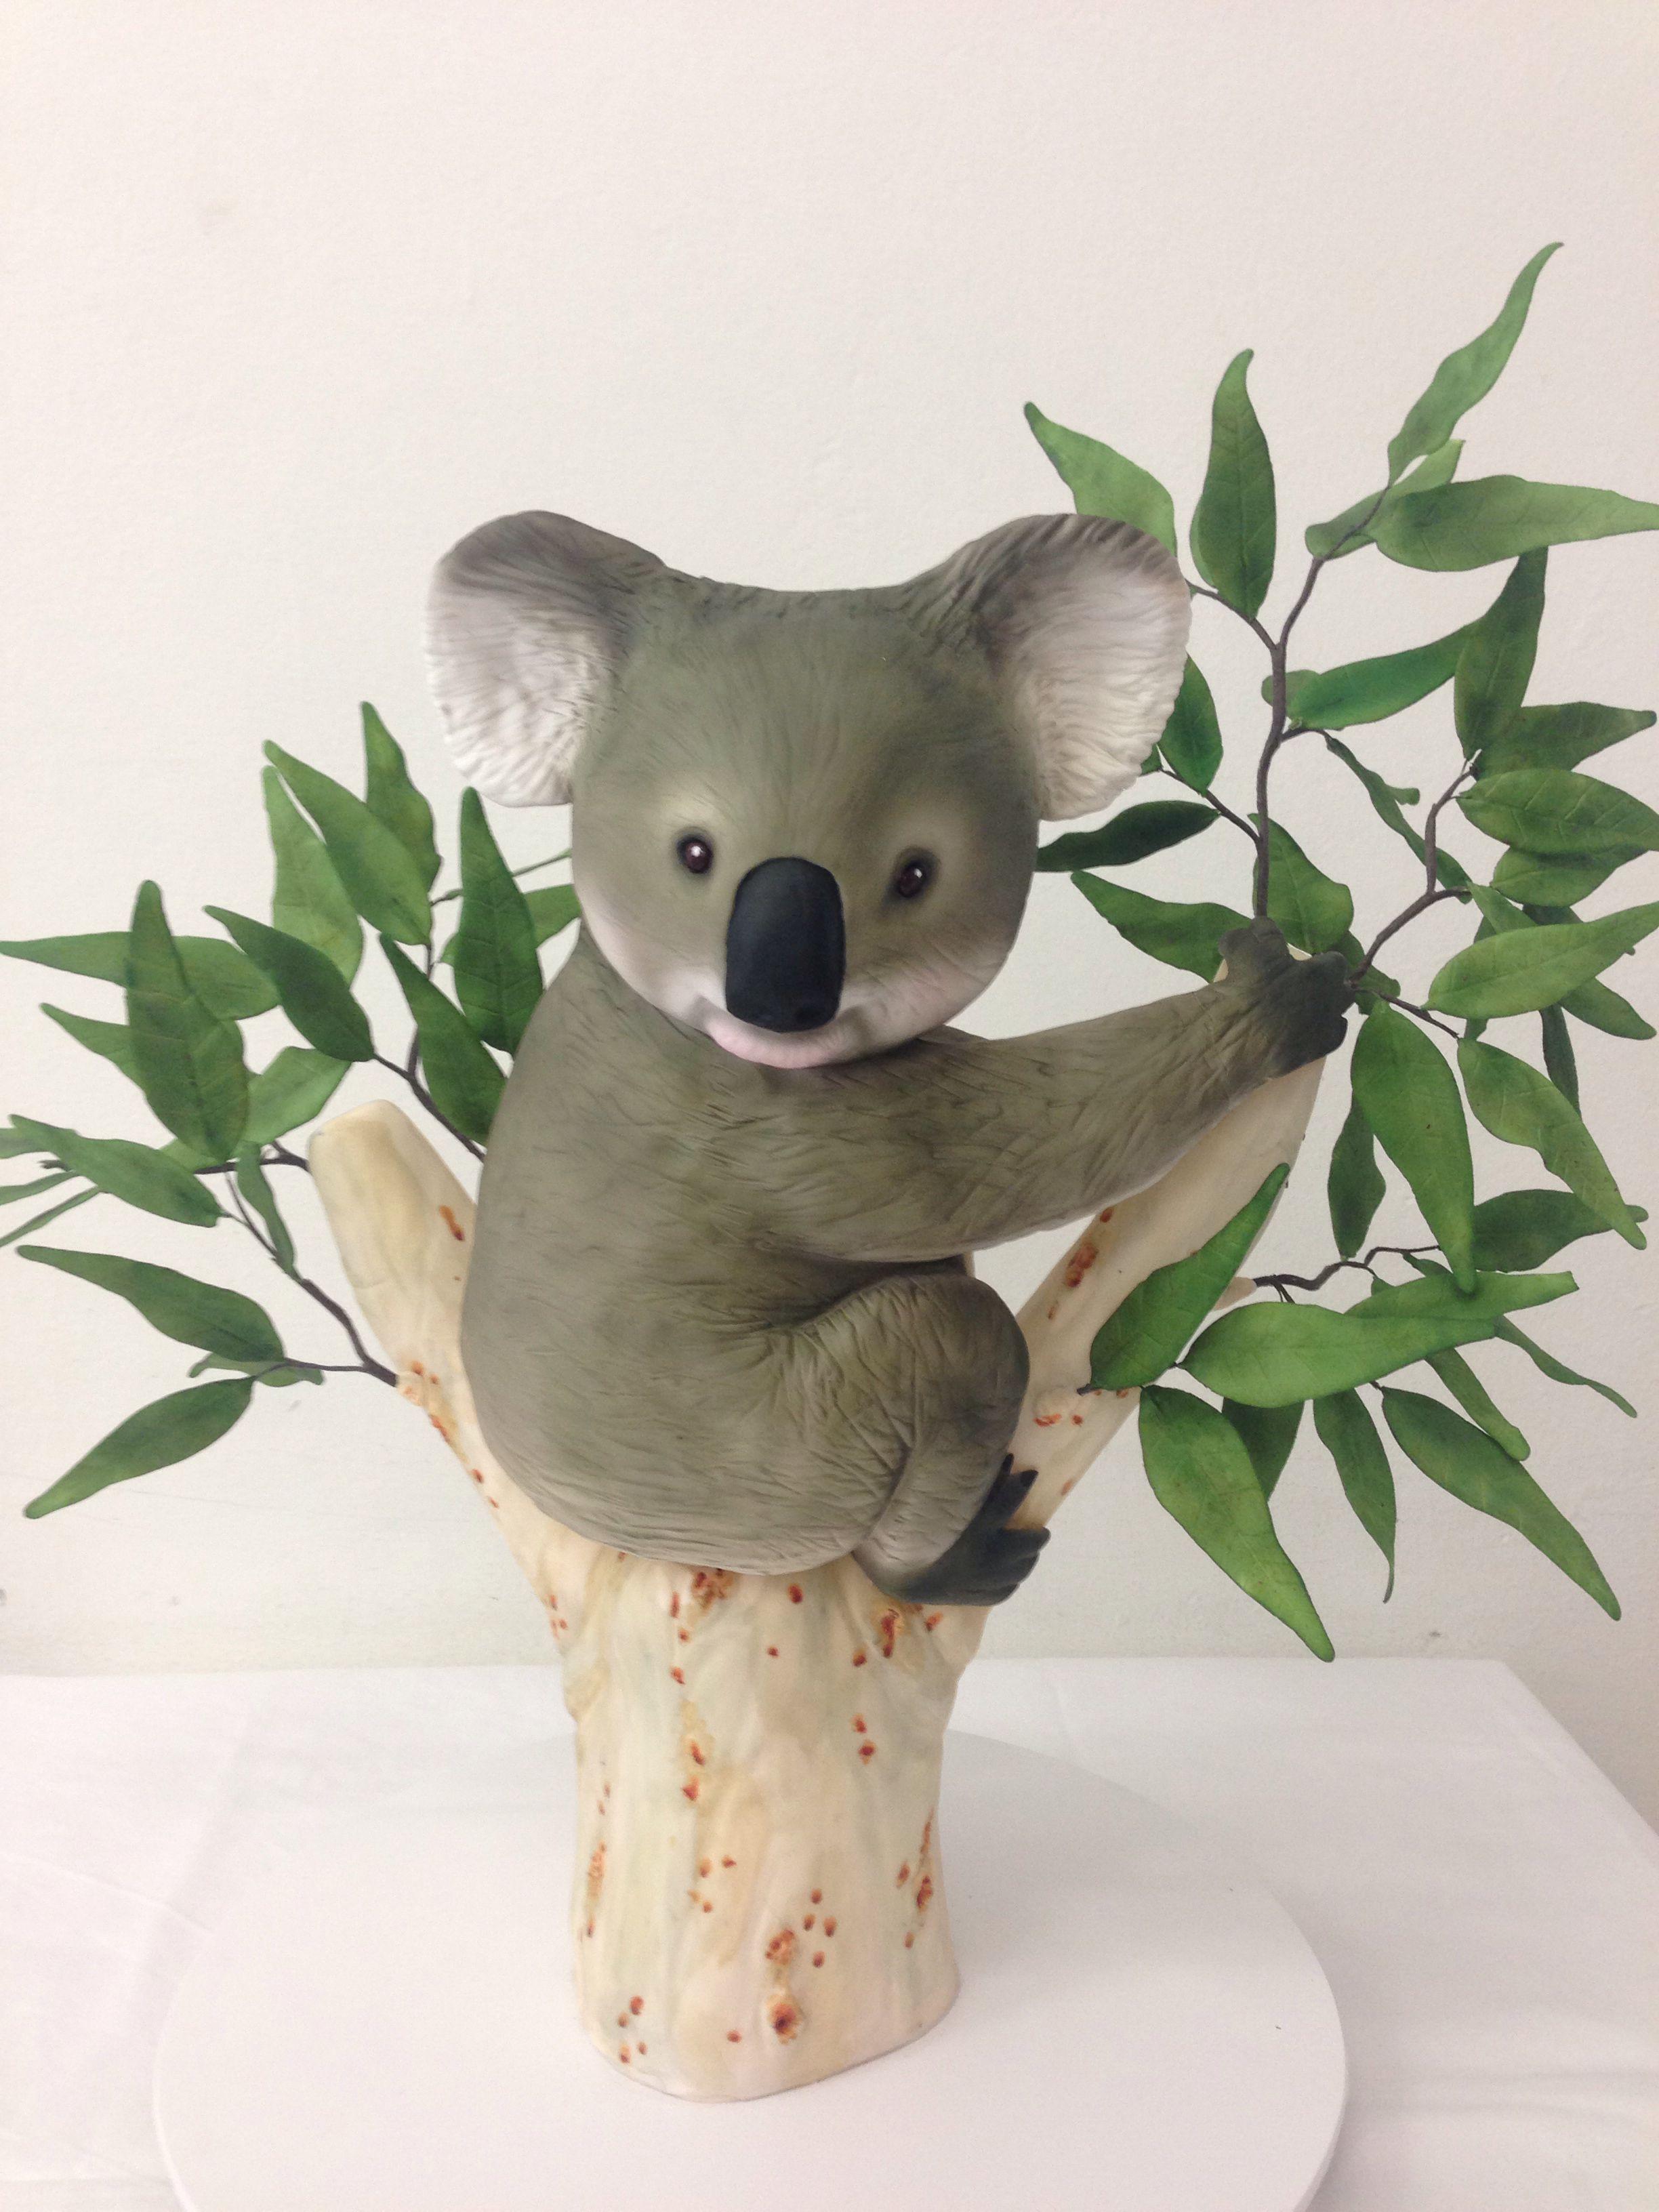 Koala Cake To Celebrate Australia Day 2014 By Handi S